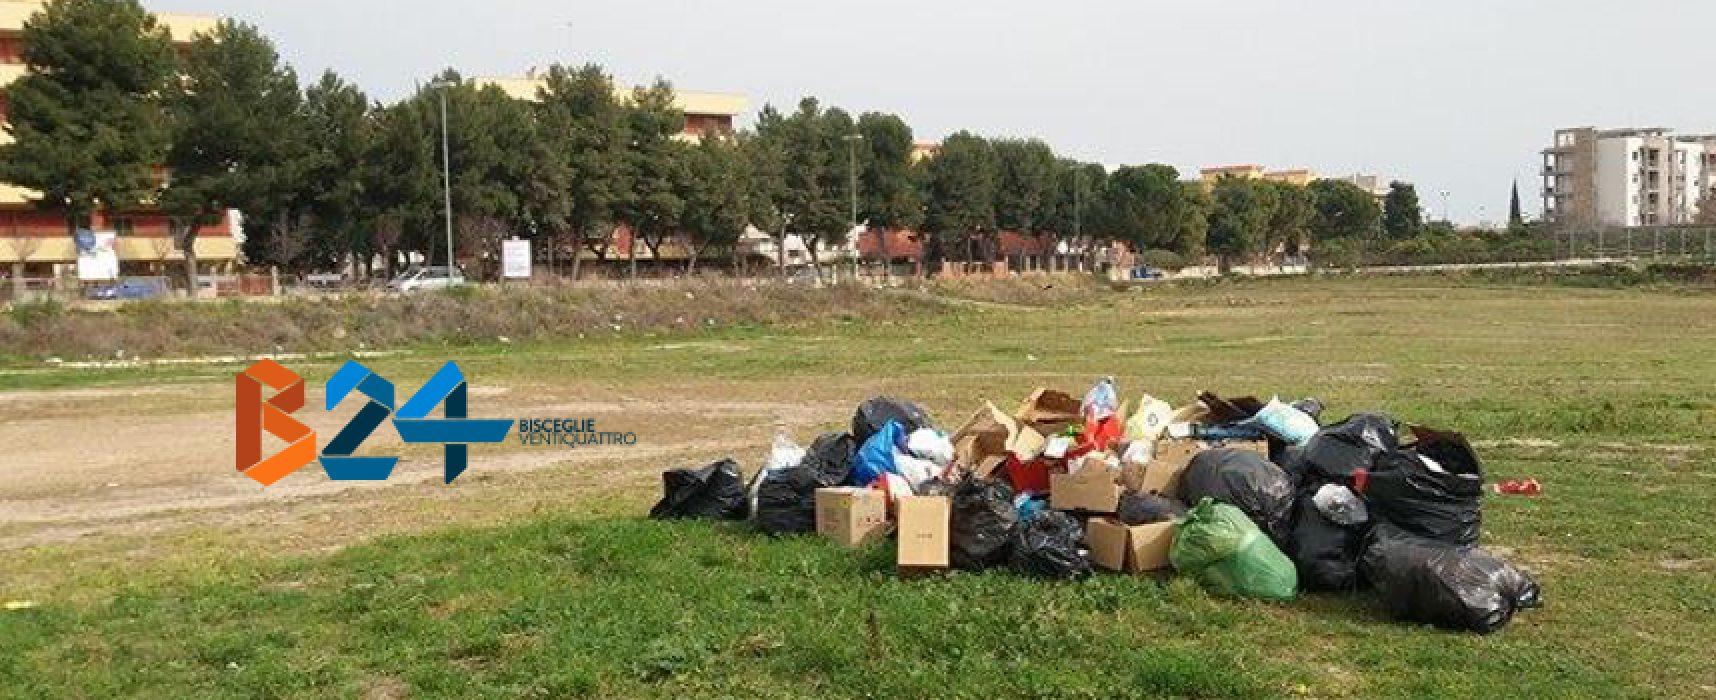 Ancora rifiuti abbandonati, cumuli di bustoni sui terreni di via san Martino / FOTO